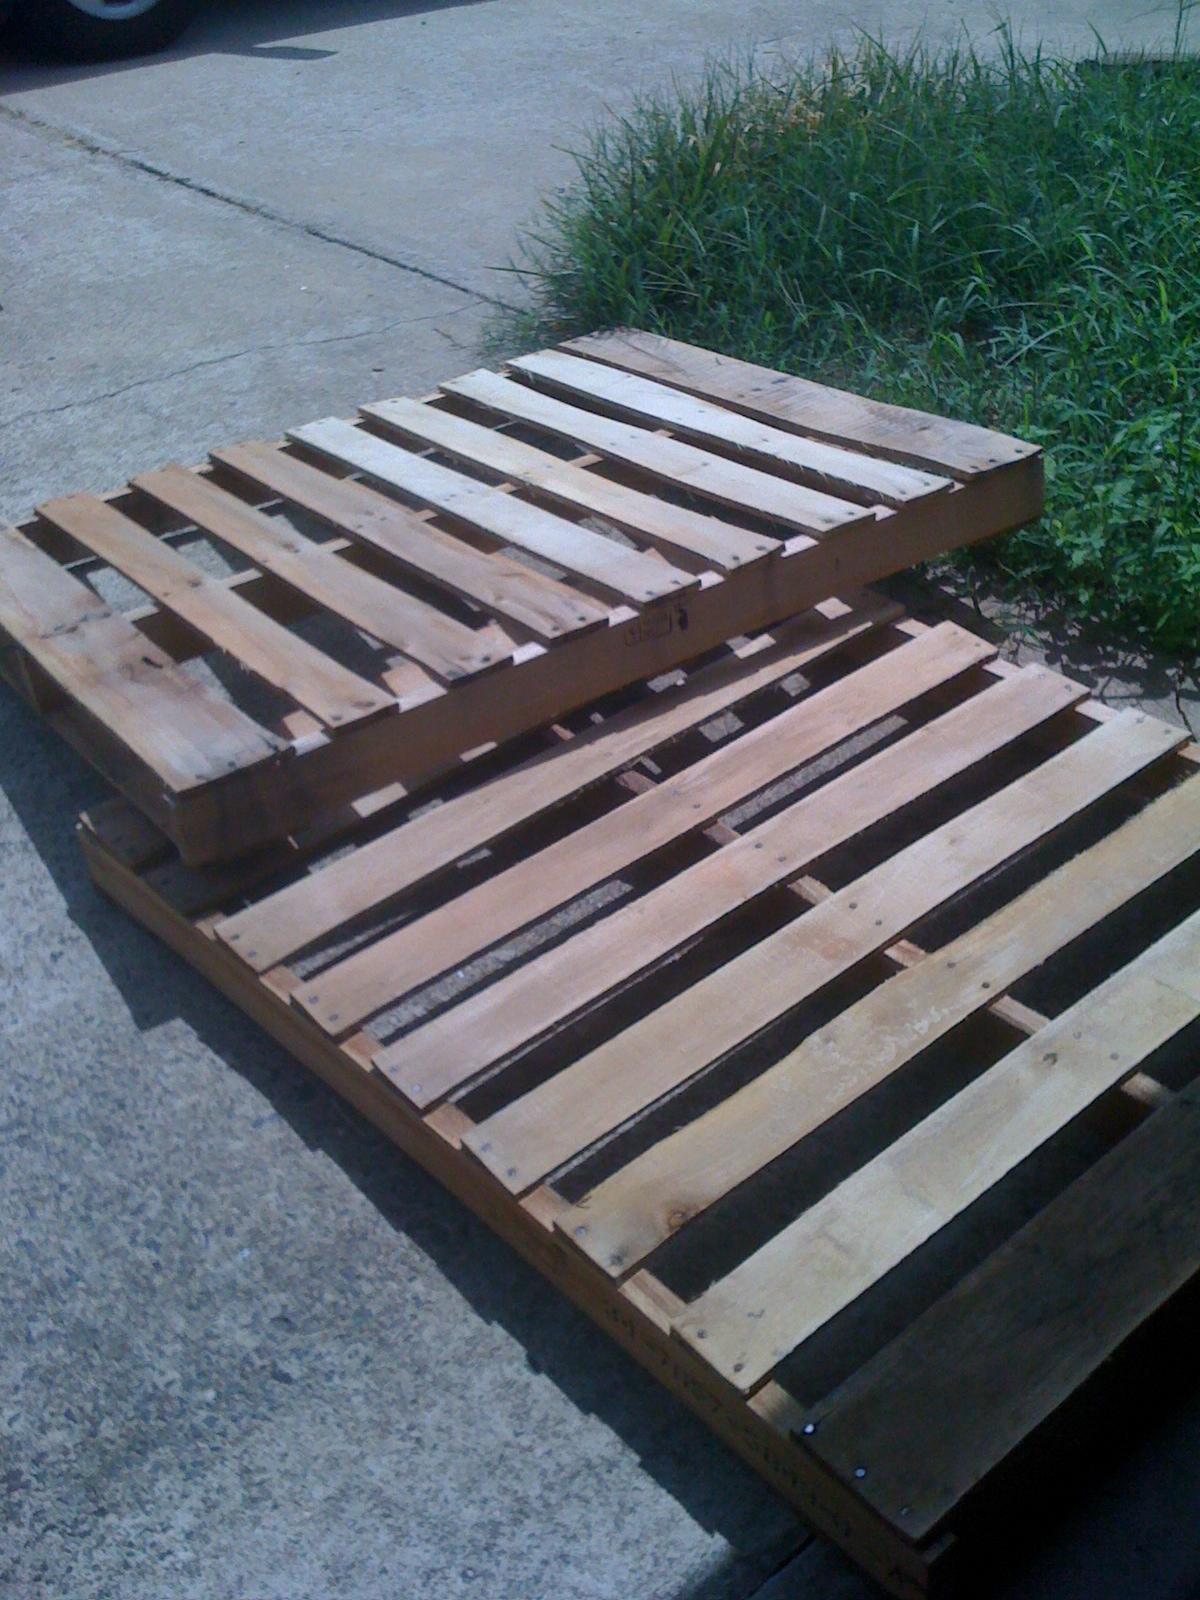 Diy bunk beds free plans happy memorial day 2014 for Diy pallet loft bed plans